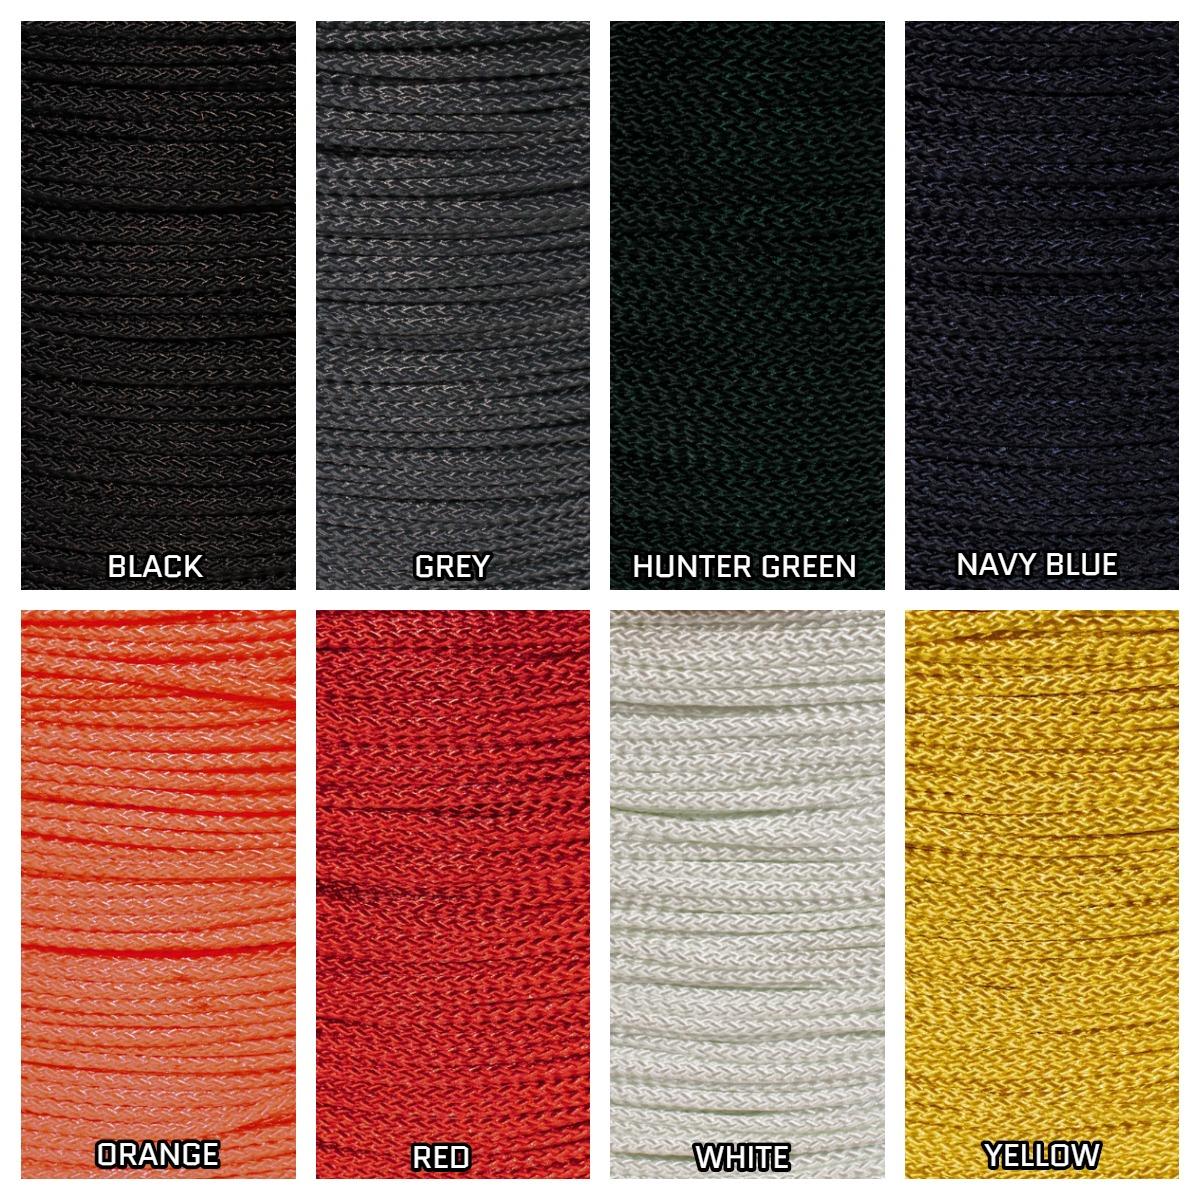 KnotRite 100/% Nylon Rope 1//4 x 100 ft Quality Nylon Rope